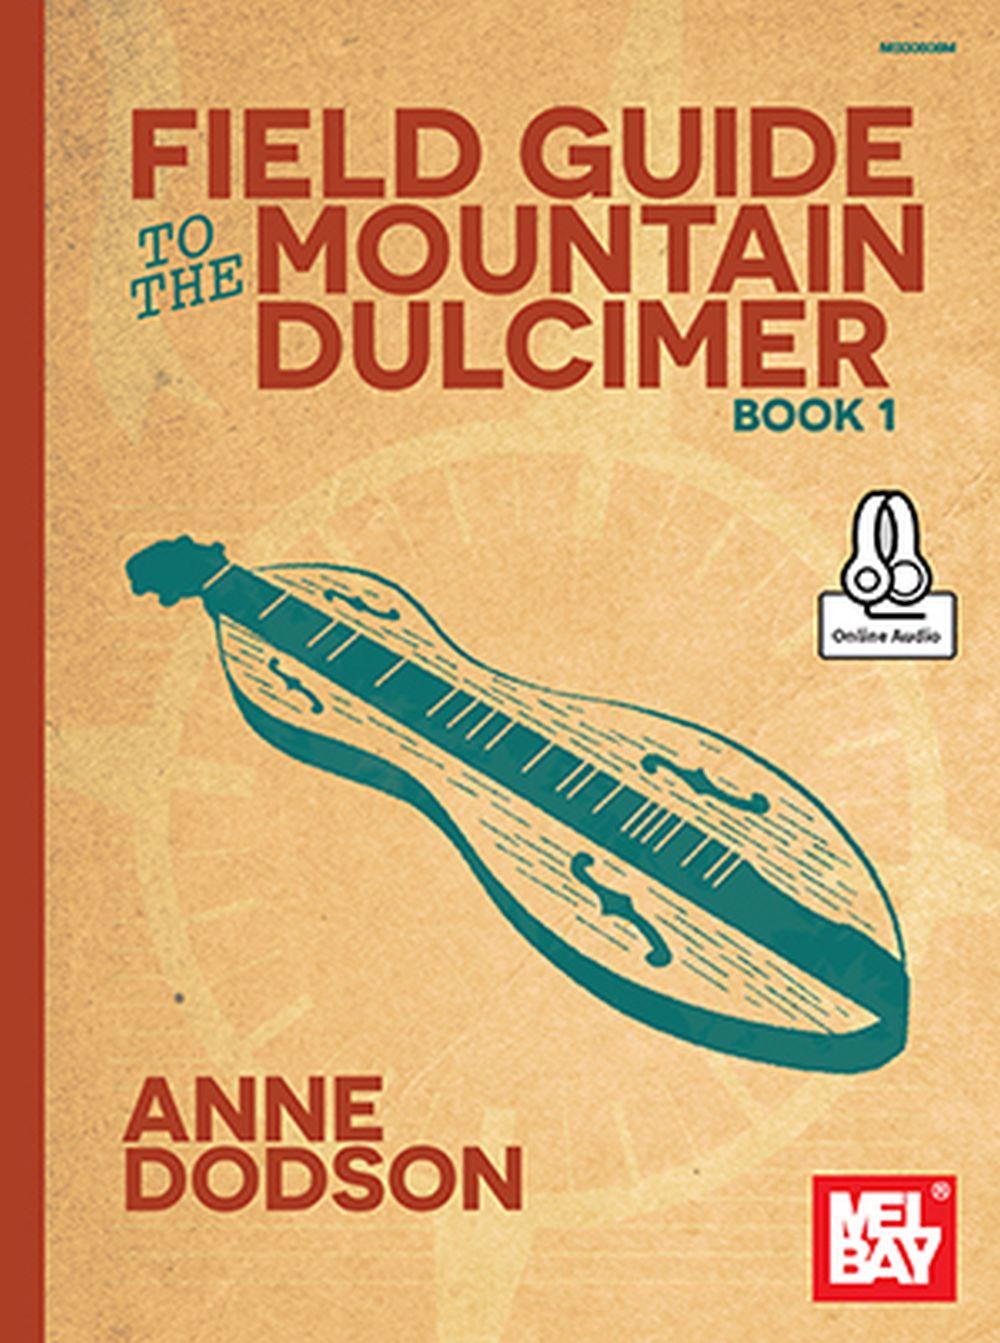 Anne Dodson: Field Guide To The Mountain Dulcimer  Book 1: Dulcimer: